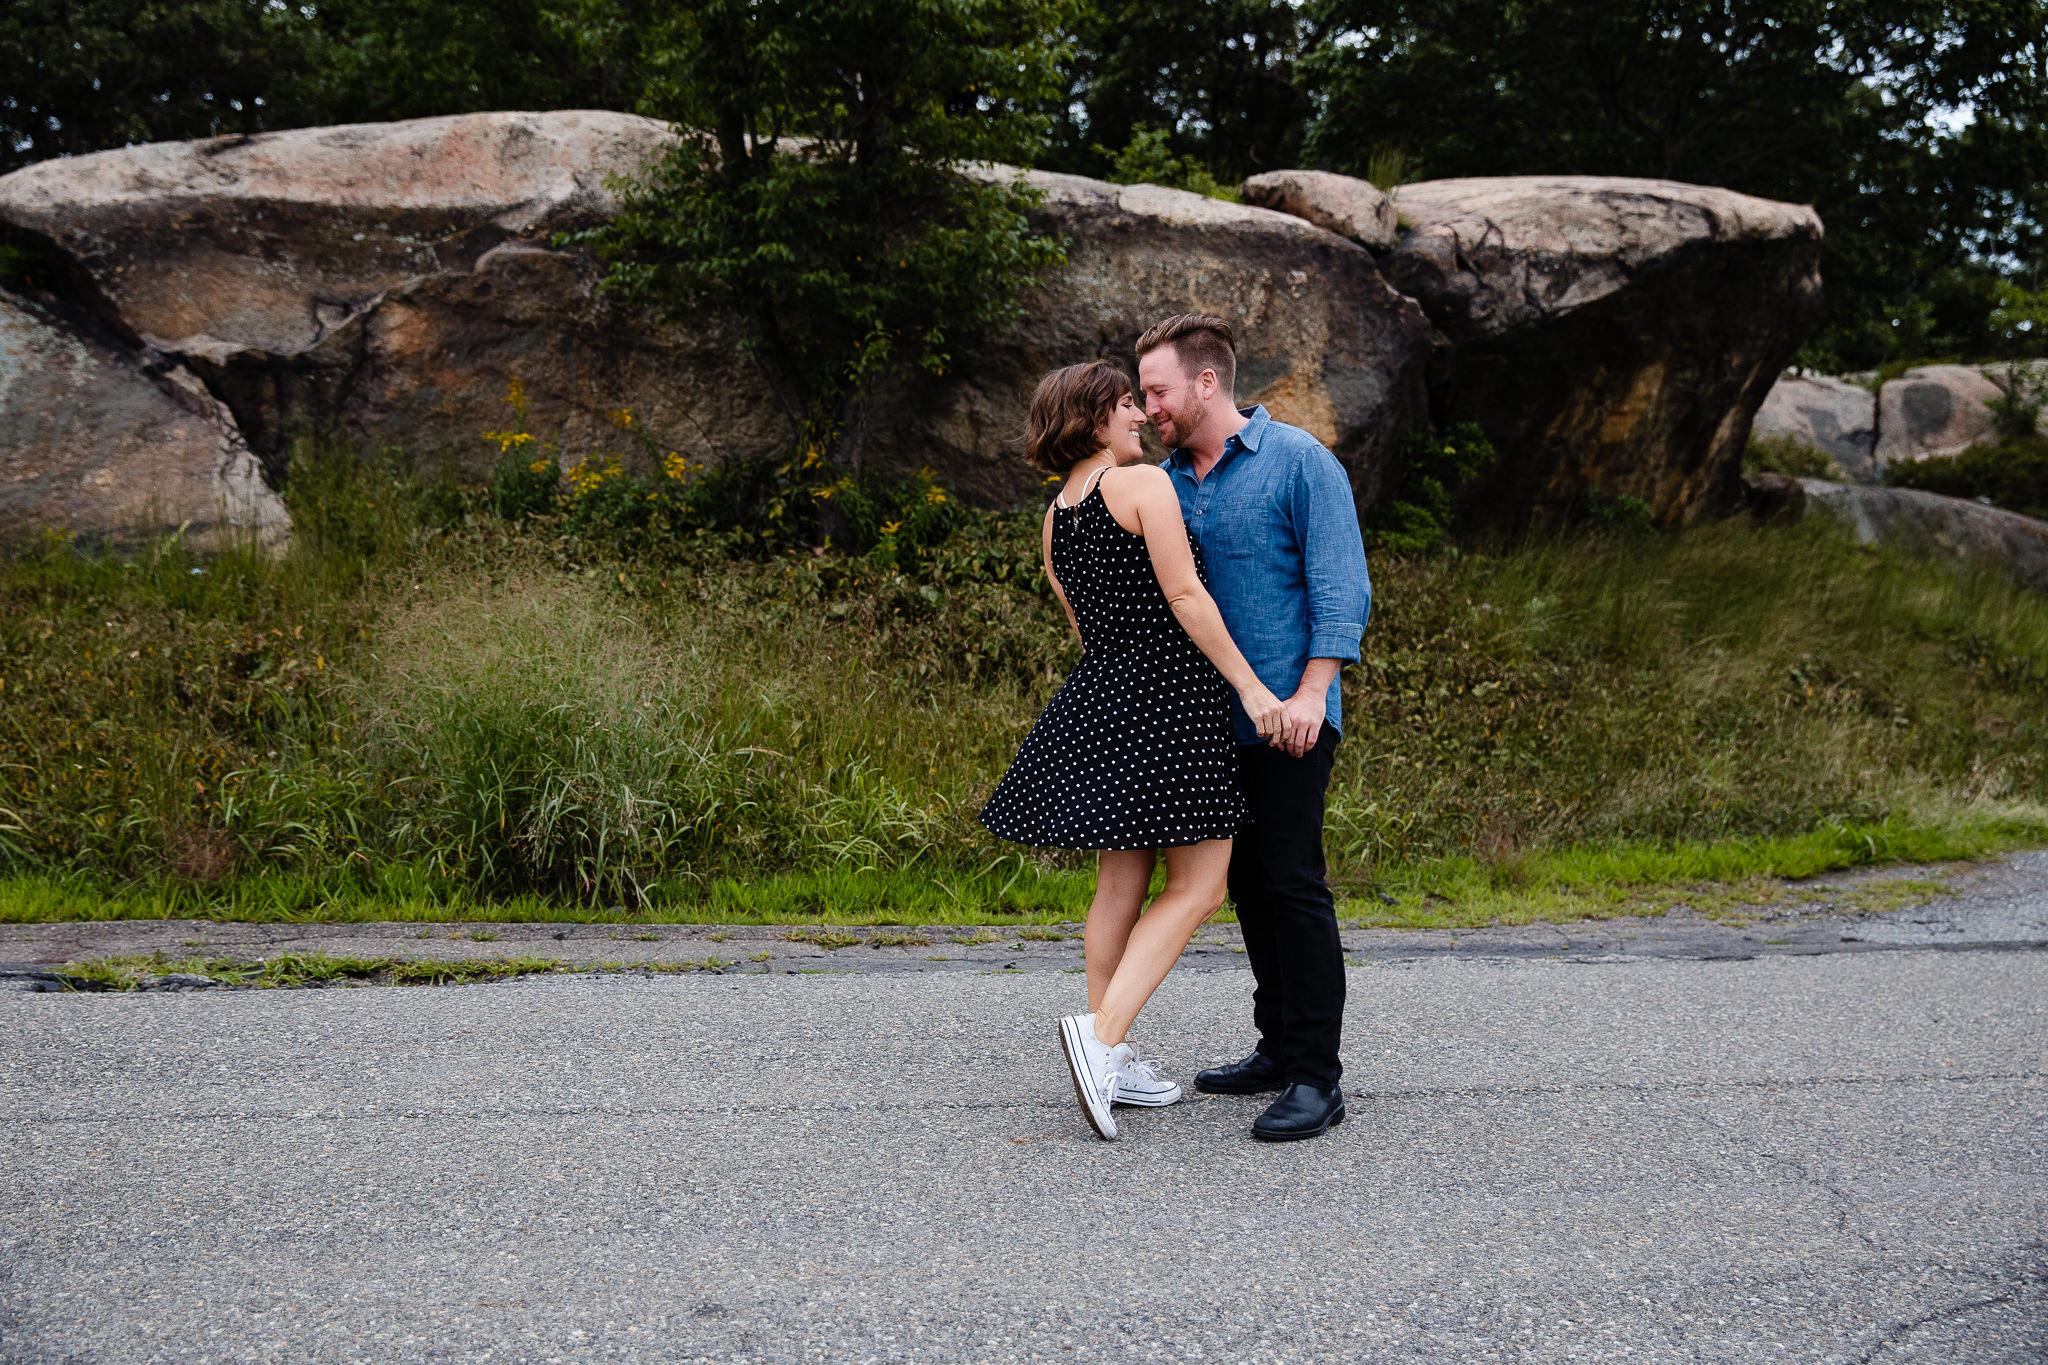 New York Wedding Photographer, Brooklyn Wedding Photographer, Bear Mountain Engagement Session, Hudson Valley Wedding Photographer, Long Island Wedding Photographer, New York City Wedding